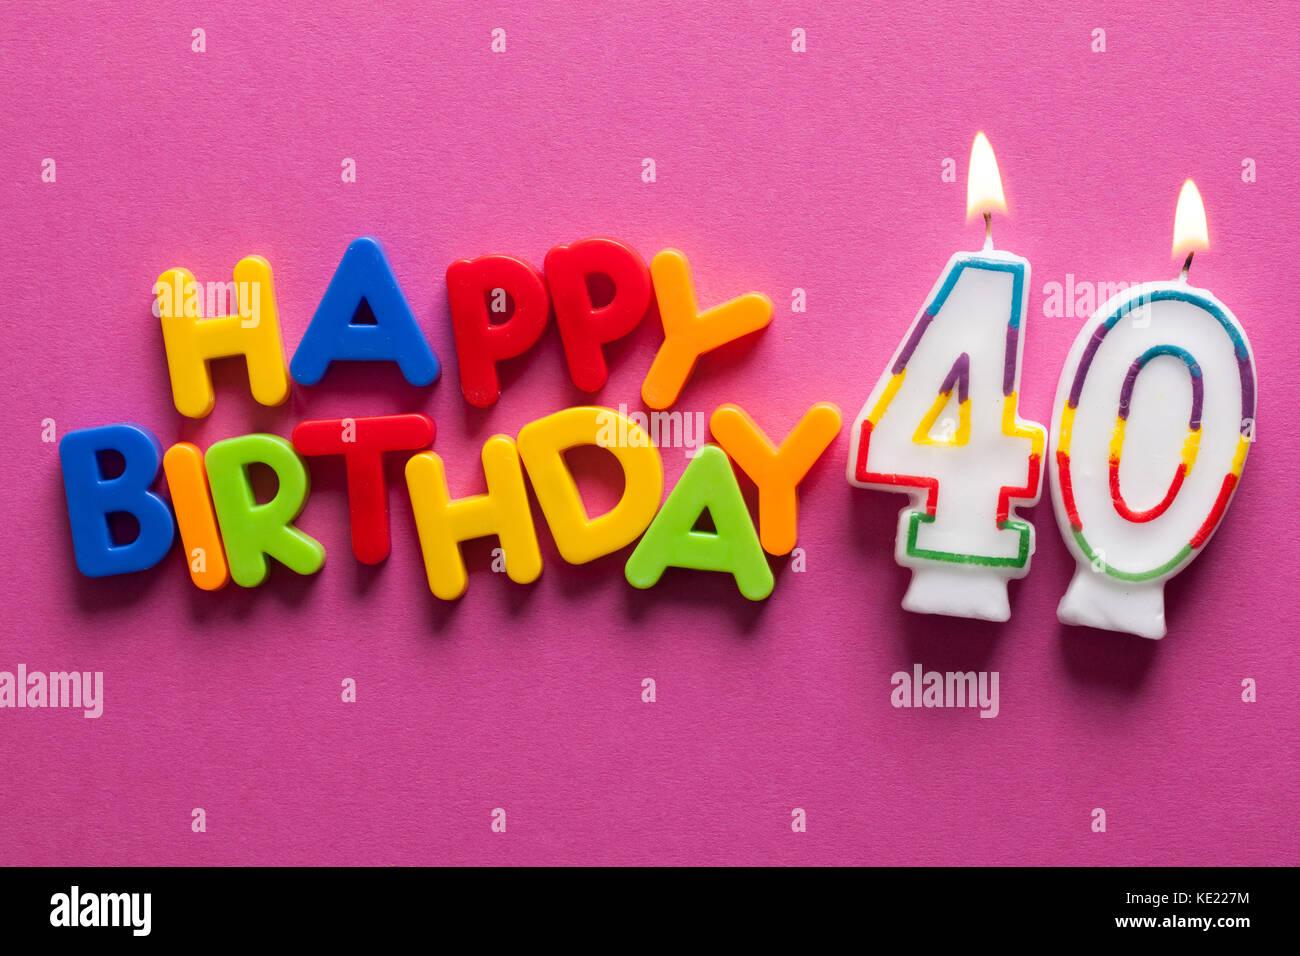 Imagenes De Cumpleanos Numero 40.Feliz Cumpleanos Numero 40 Celebracion Vela Foto Imagen De